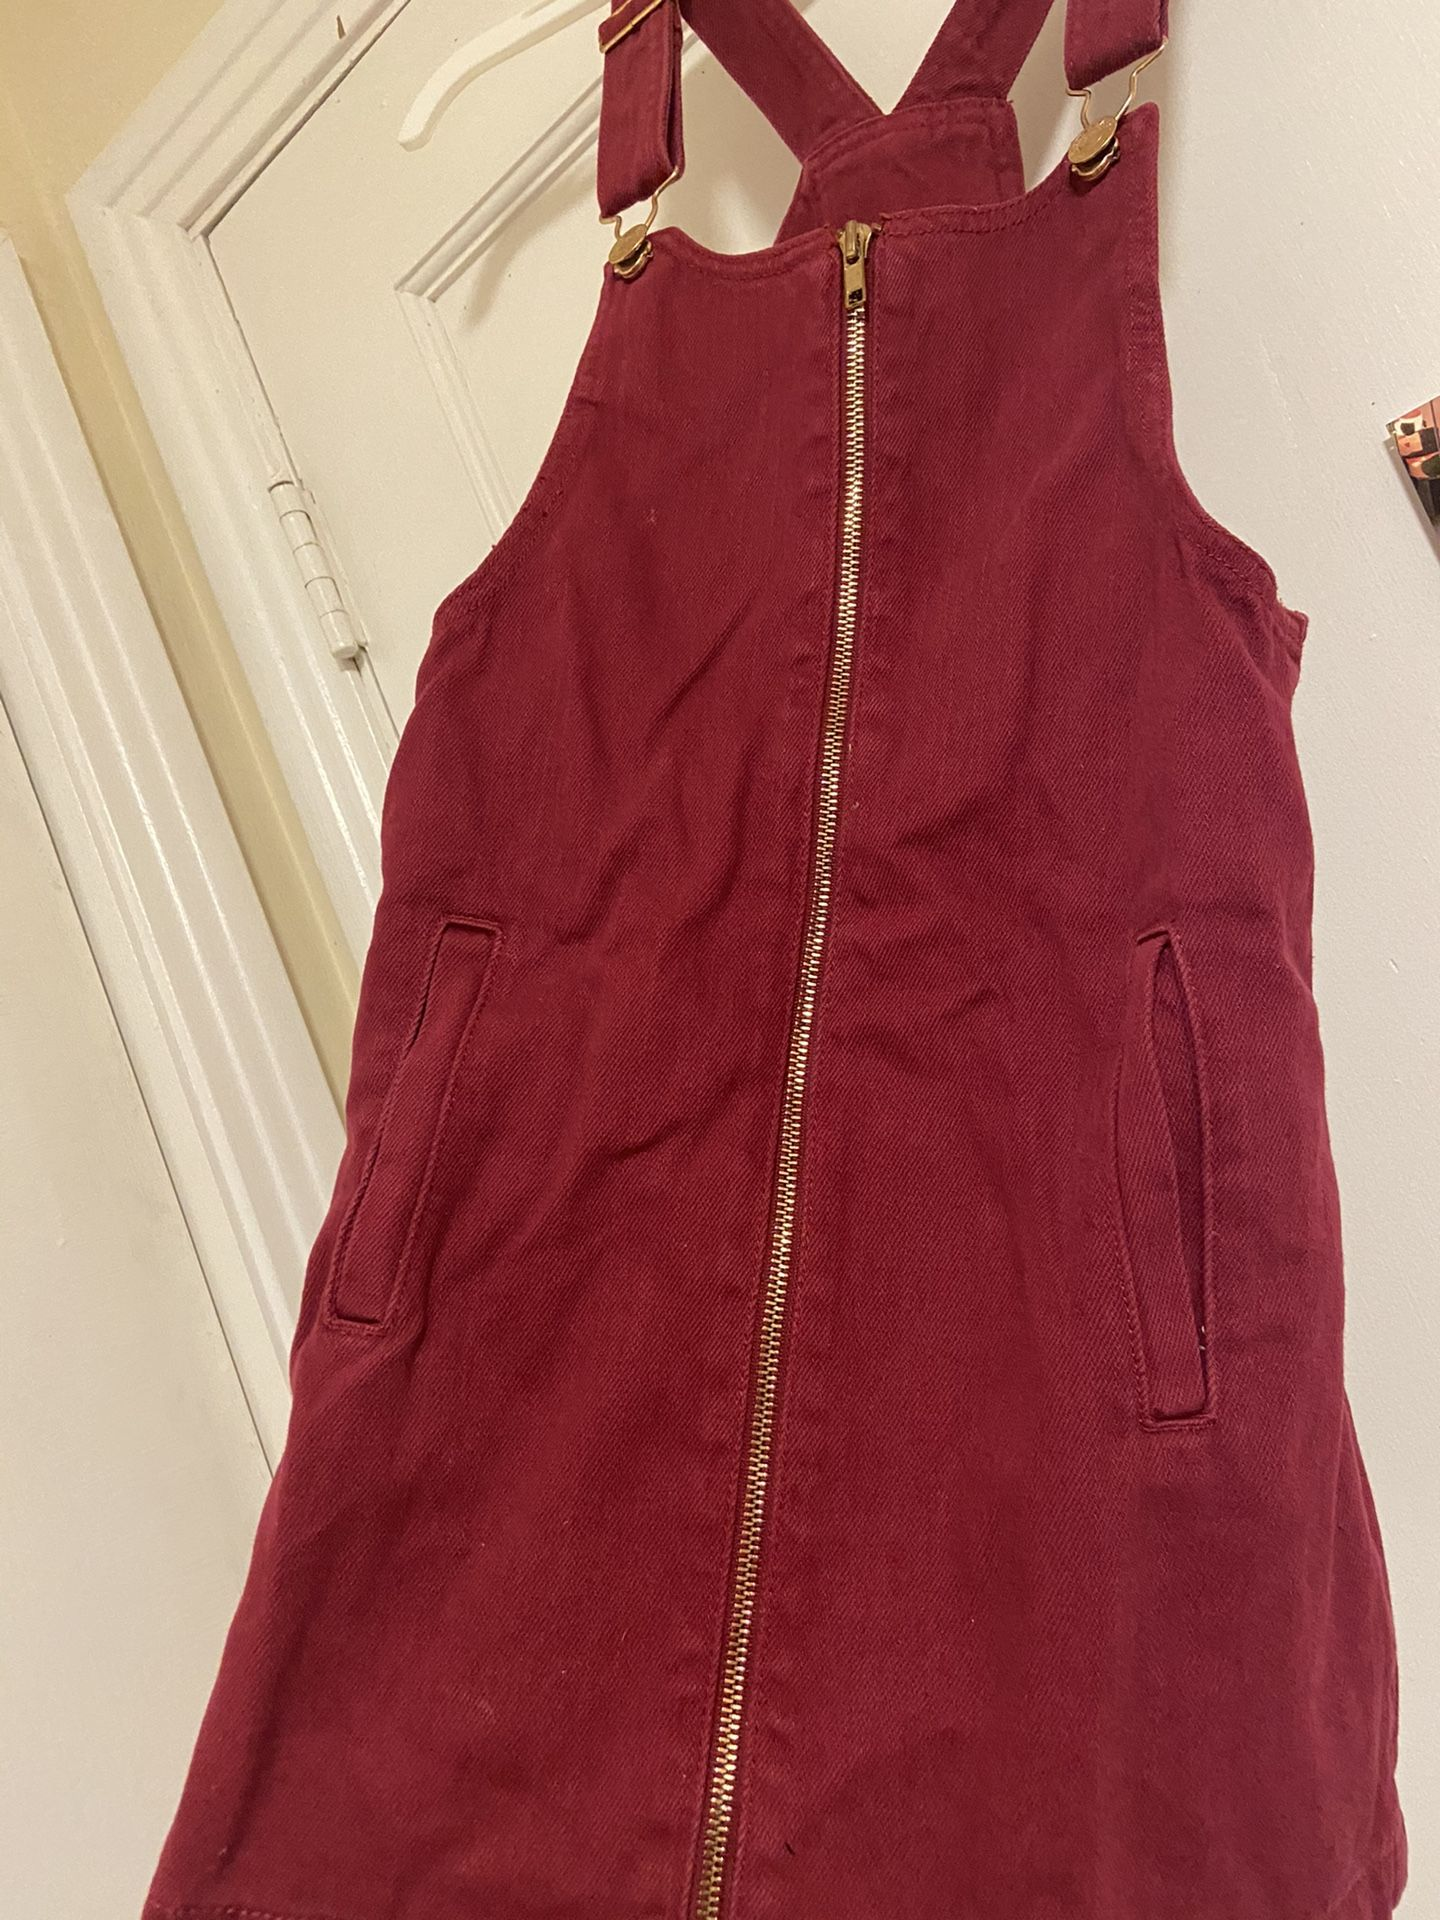 Forever21 Burgundy Zip Up Overall Dress